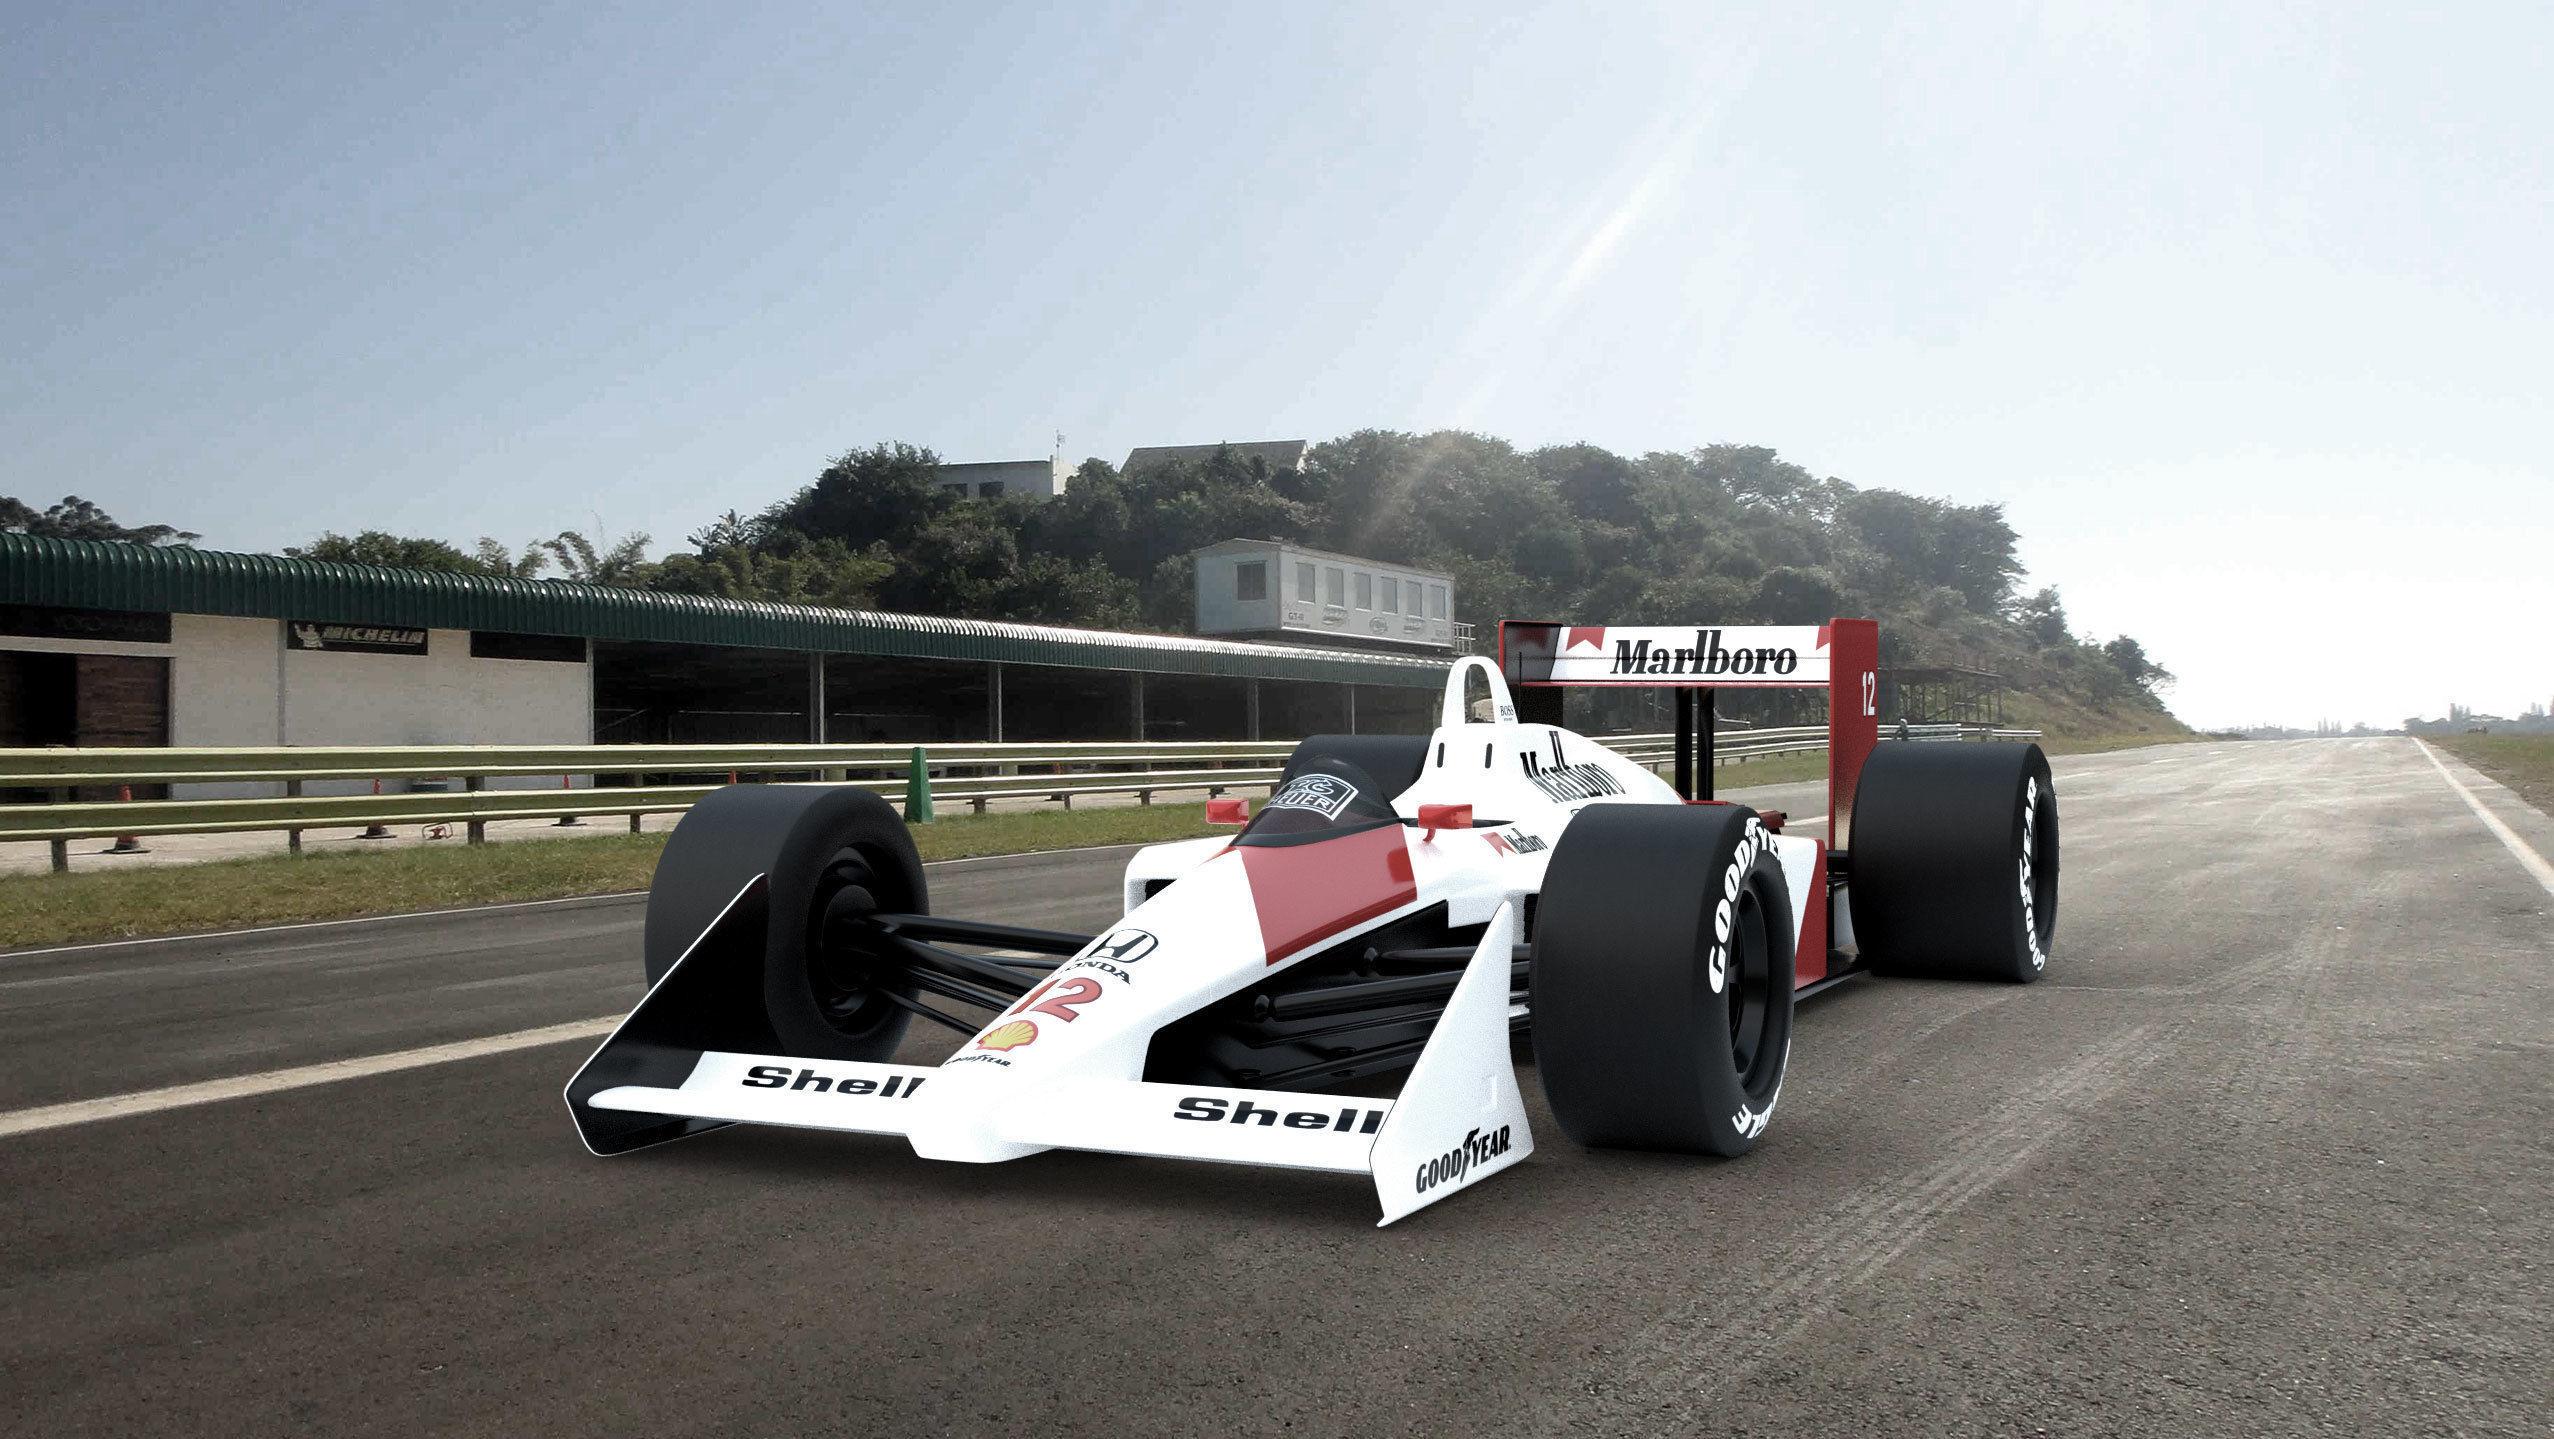 Classic Formula one McLaren